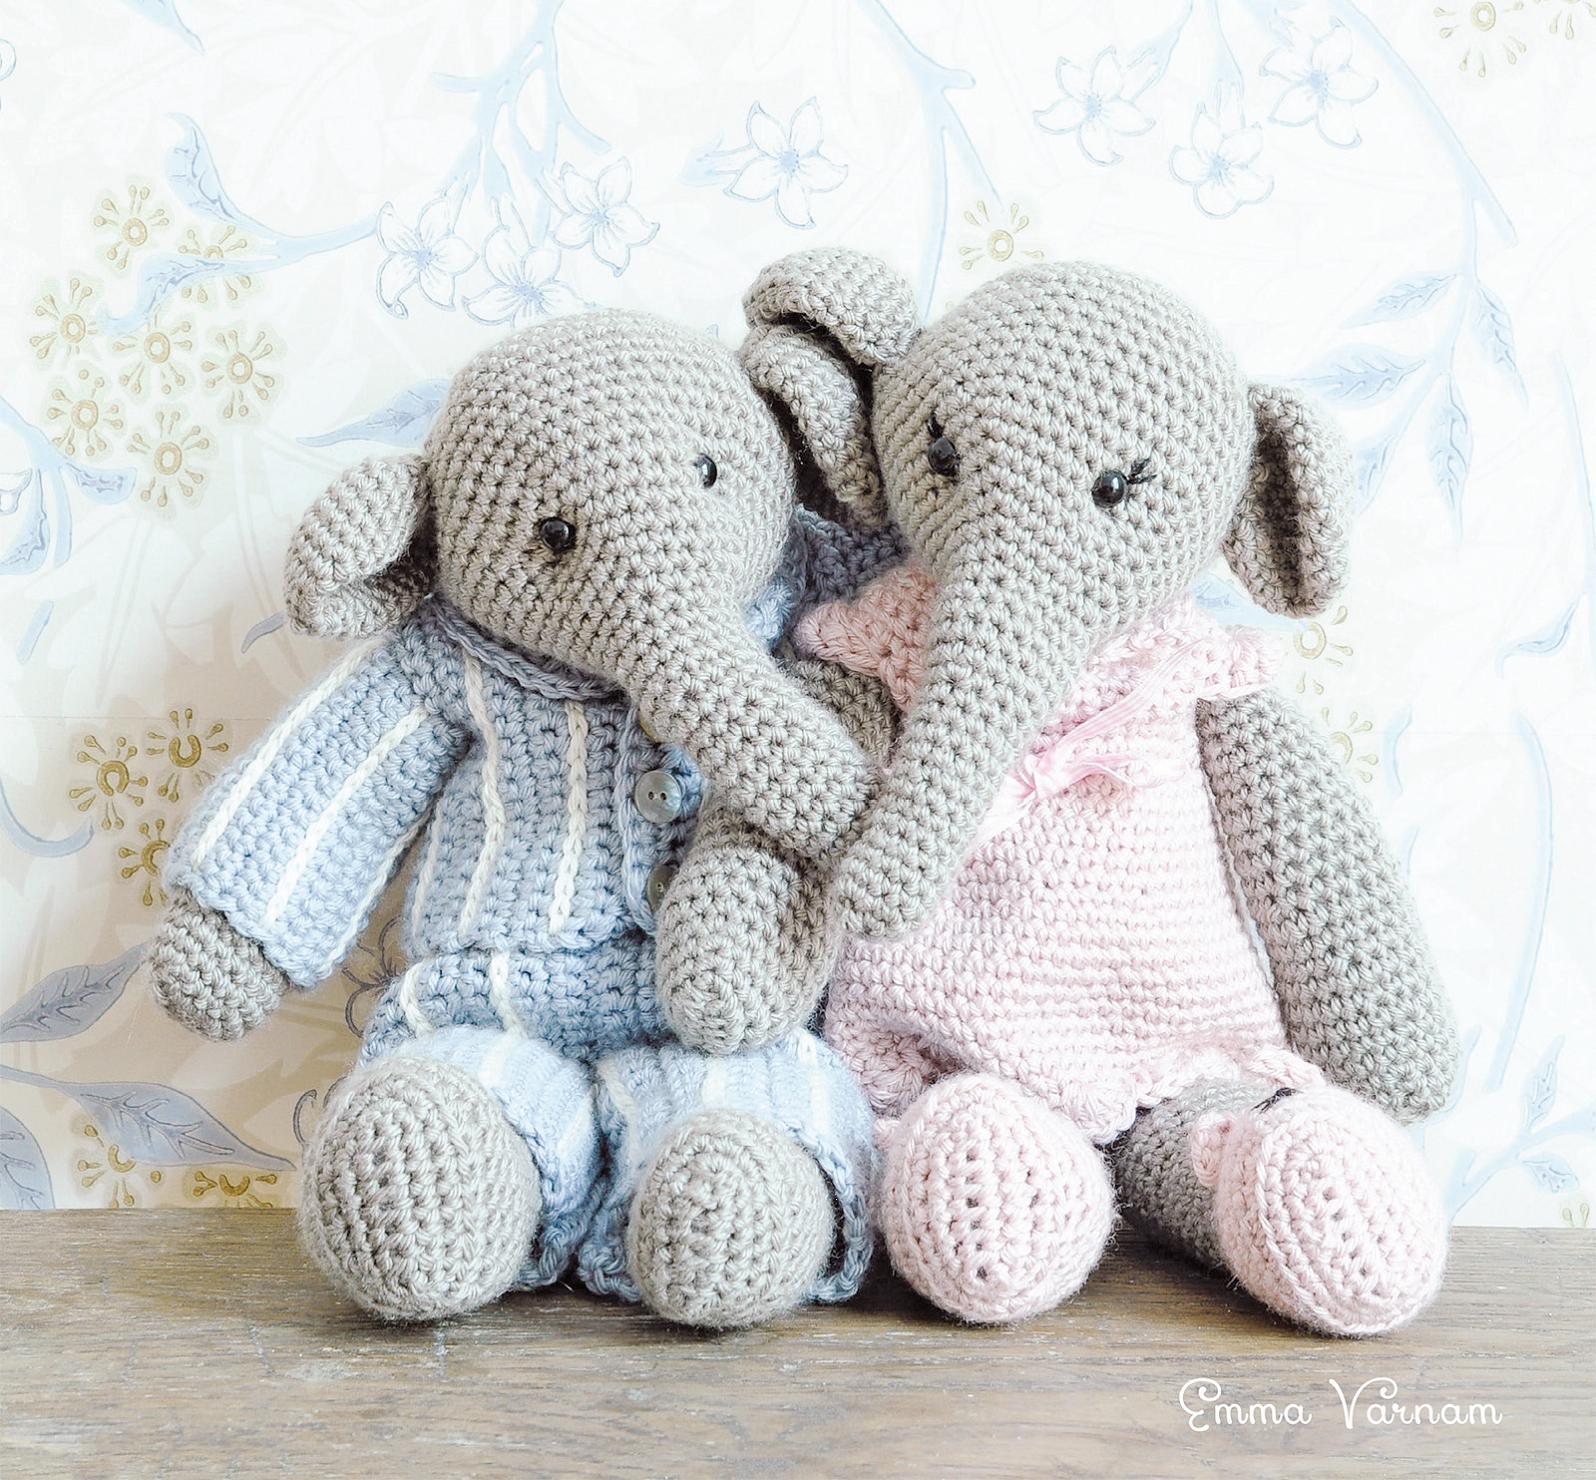 Gustav, Elephant Amigurumi Free Pattern – Free Amigurumi Patterns in 2020 | Crochet  elephant pattern, Crochet bear patterns, Crochet elephant pattern free | 1480x1596